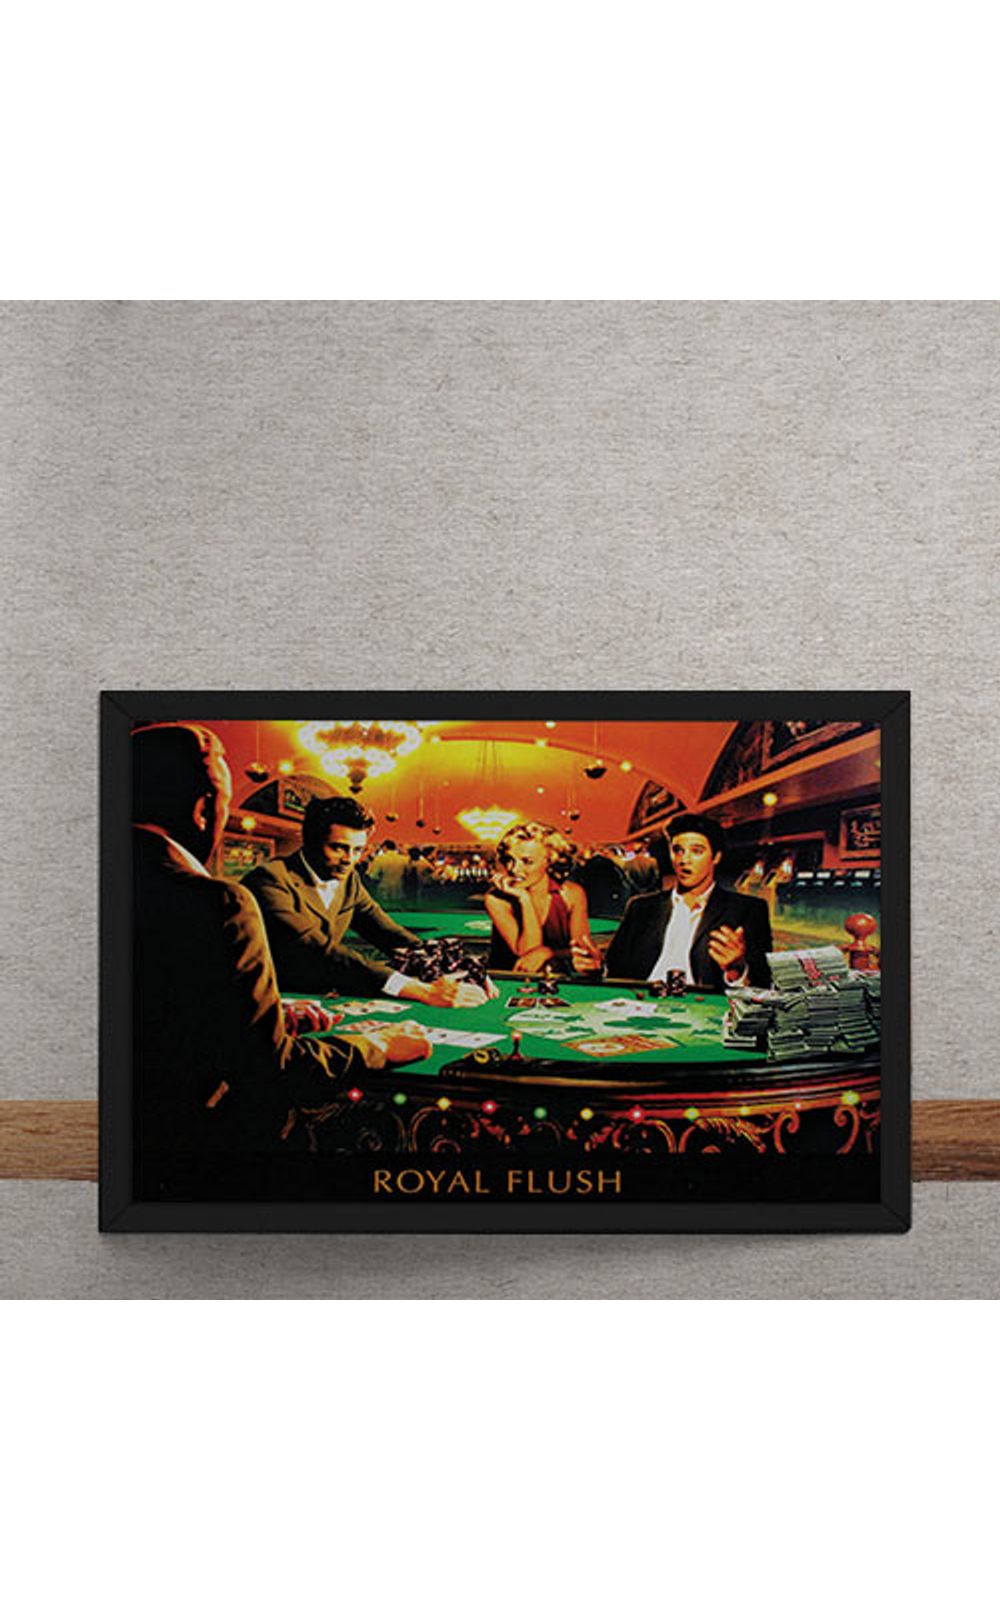 Foto 3 - Quadro Decorativo Poker Royal Flush Marylin Monroe Elvis Presley James Dean Humphrey Bogart